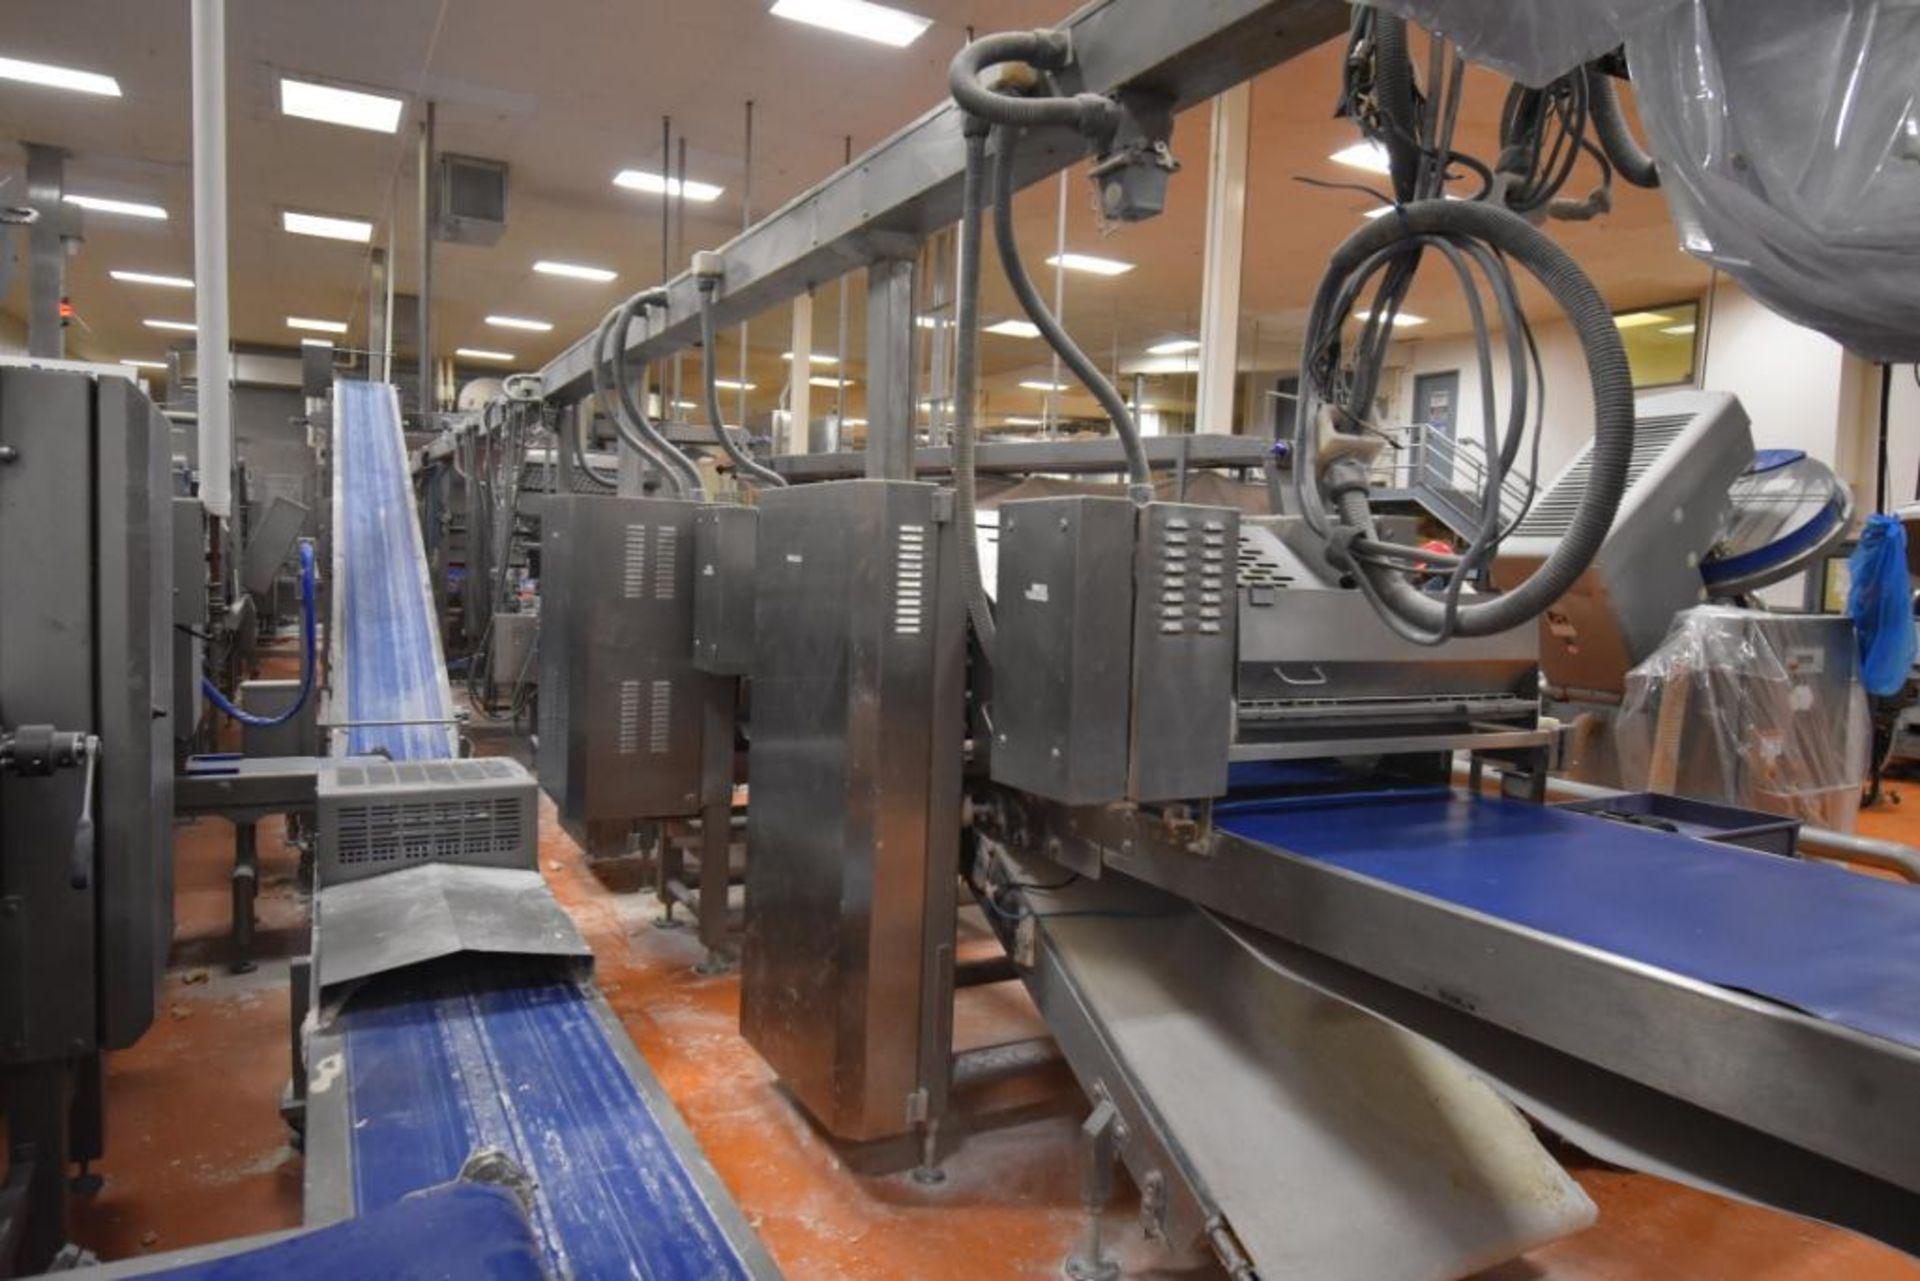 2007 Fritsch Laminator 3000 dough line - Image 104 of 280